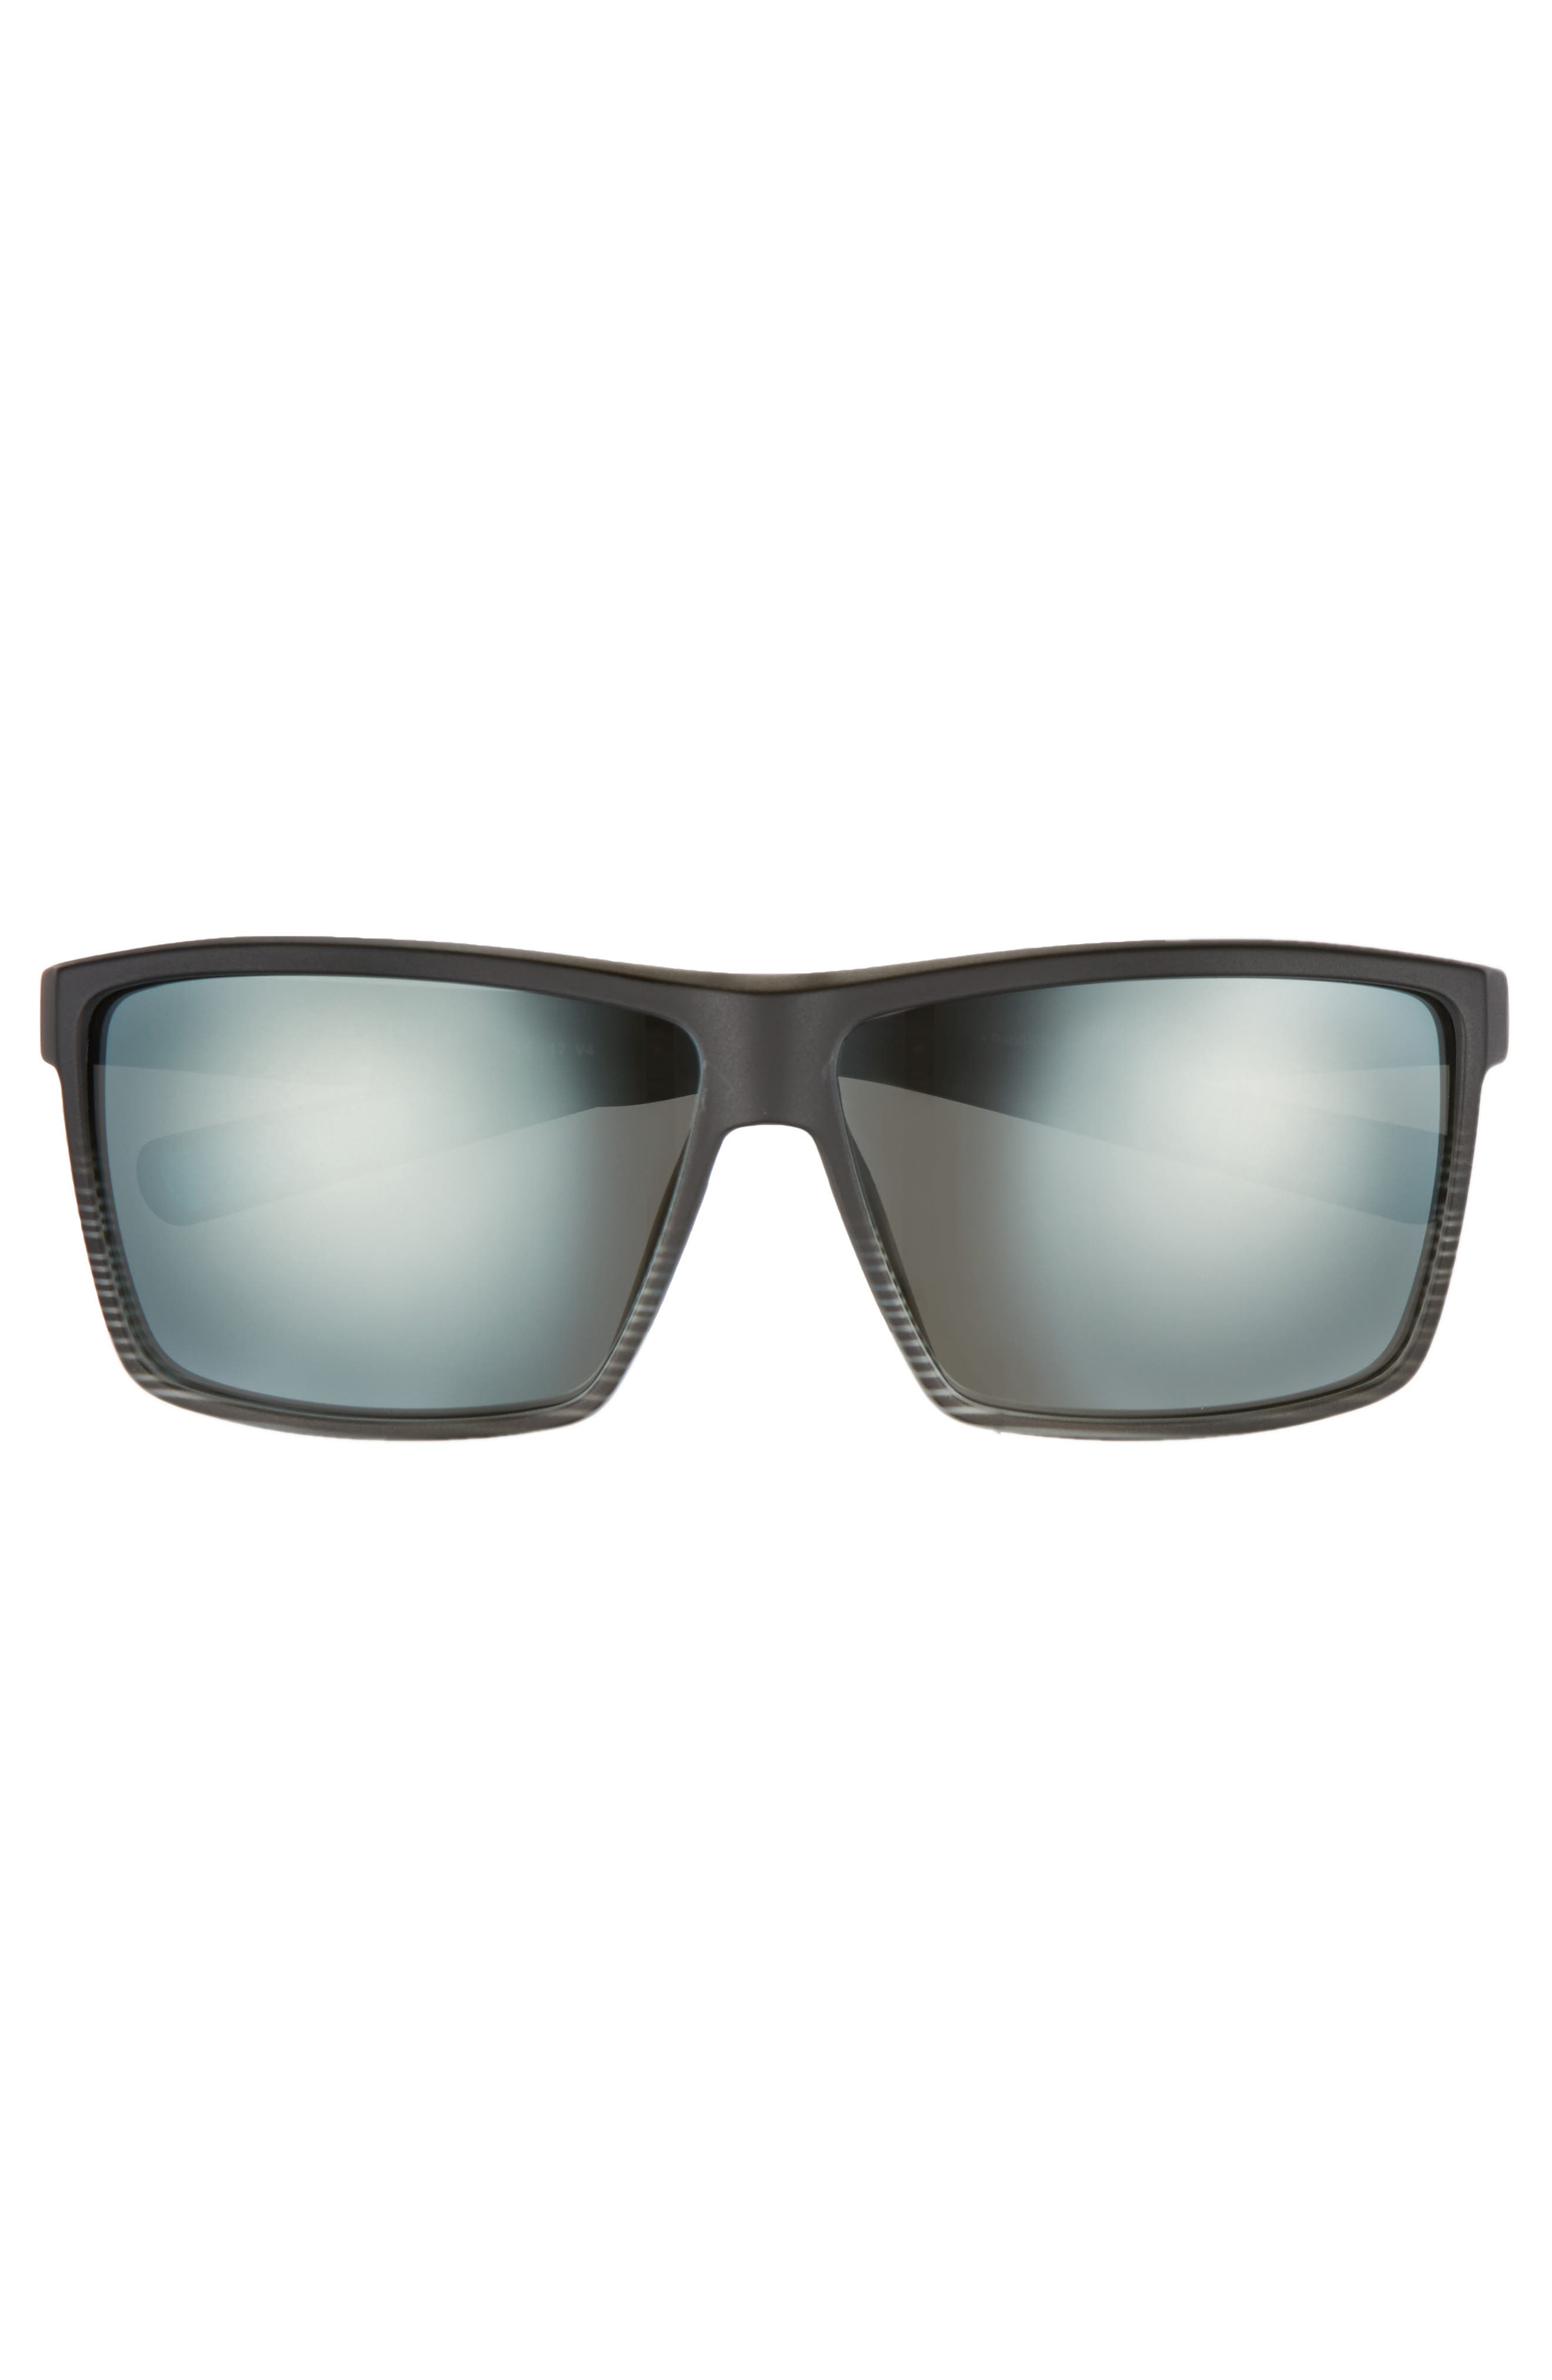 Rincon 60mm Polarized Sunglasses,                             Alternate thumbnail 2, color,                             SMOKE CRYSTAL/ SILVER MIRROR